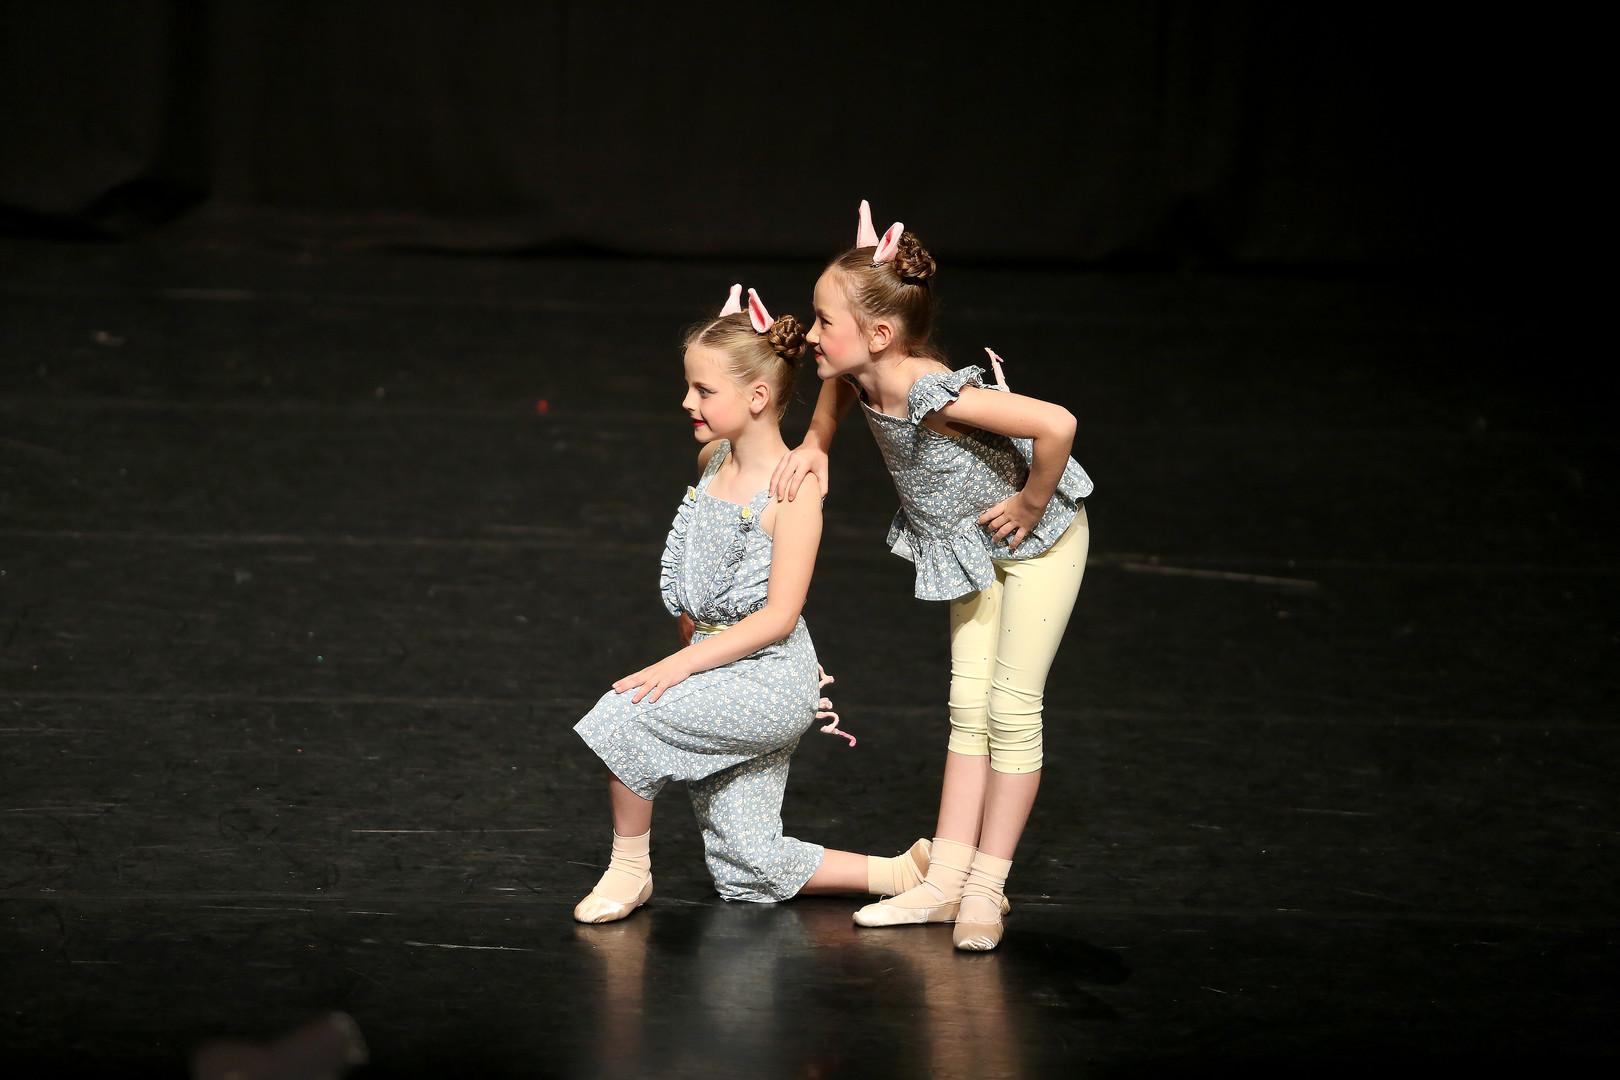 Hazel & Cora, Age 6